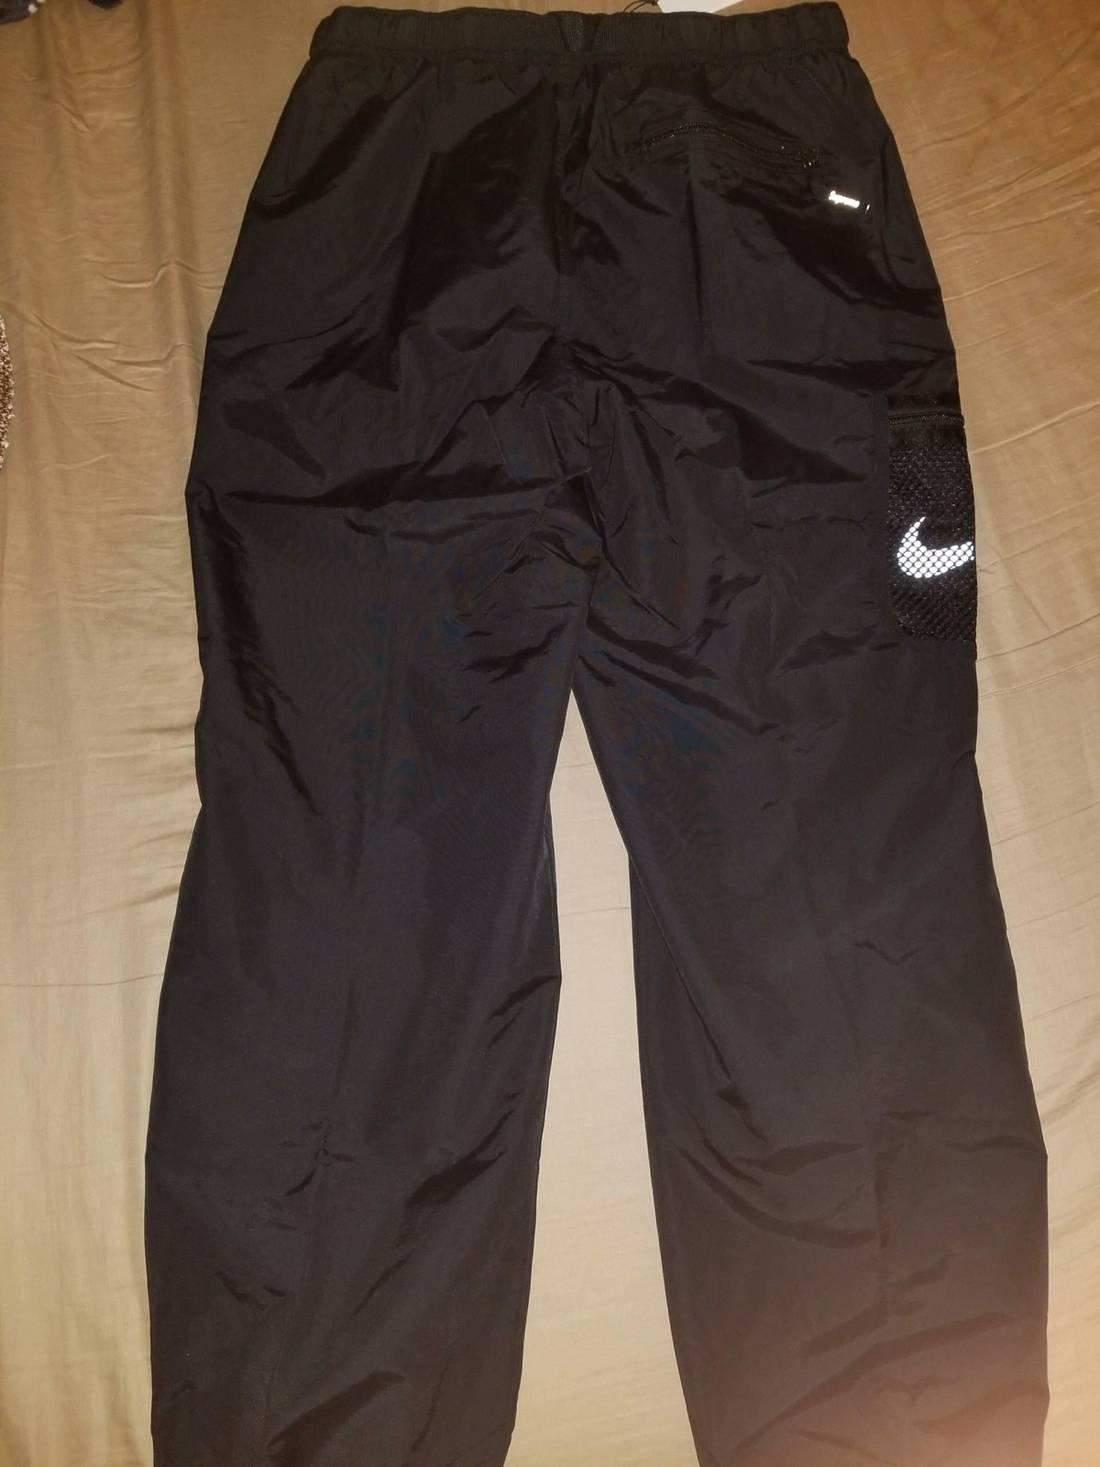 Supreme X Nike Track Pants Size US 32 EU 48